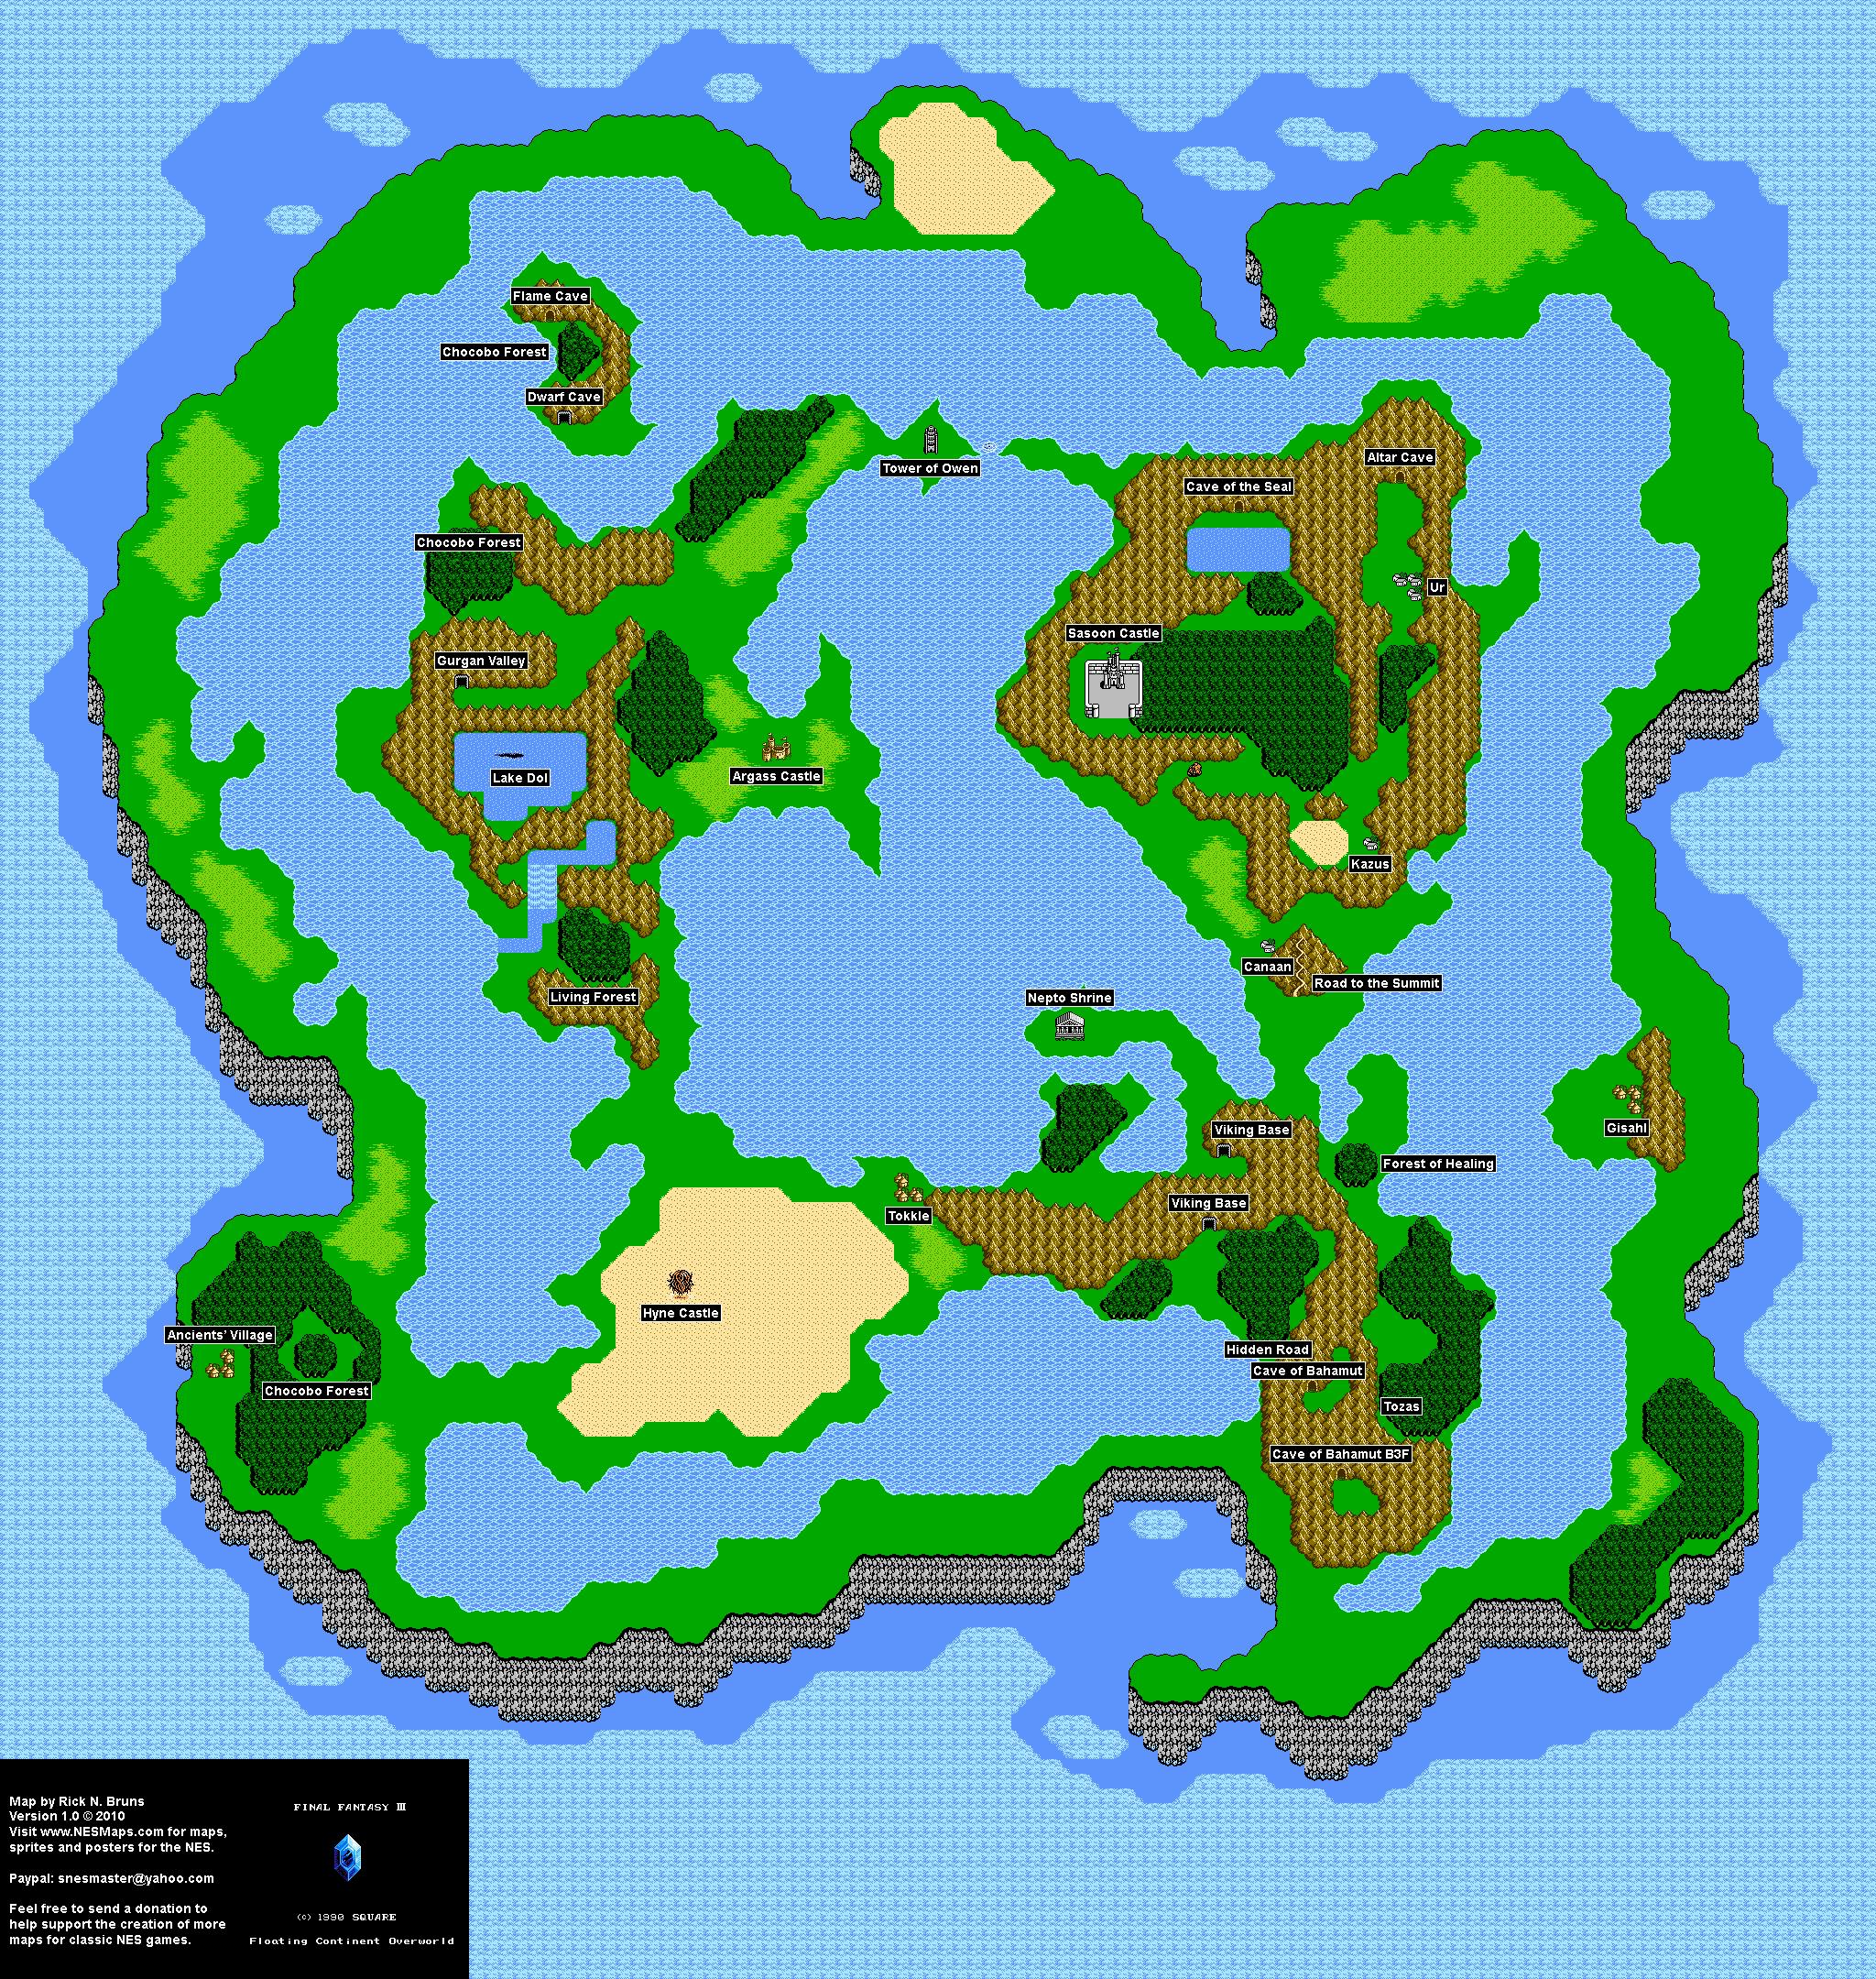 Final Fantasy III 3j Floating Continent Overworld Nintendo NES Map